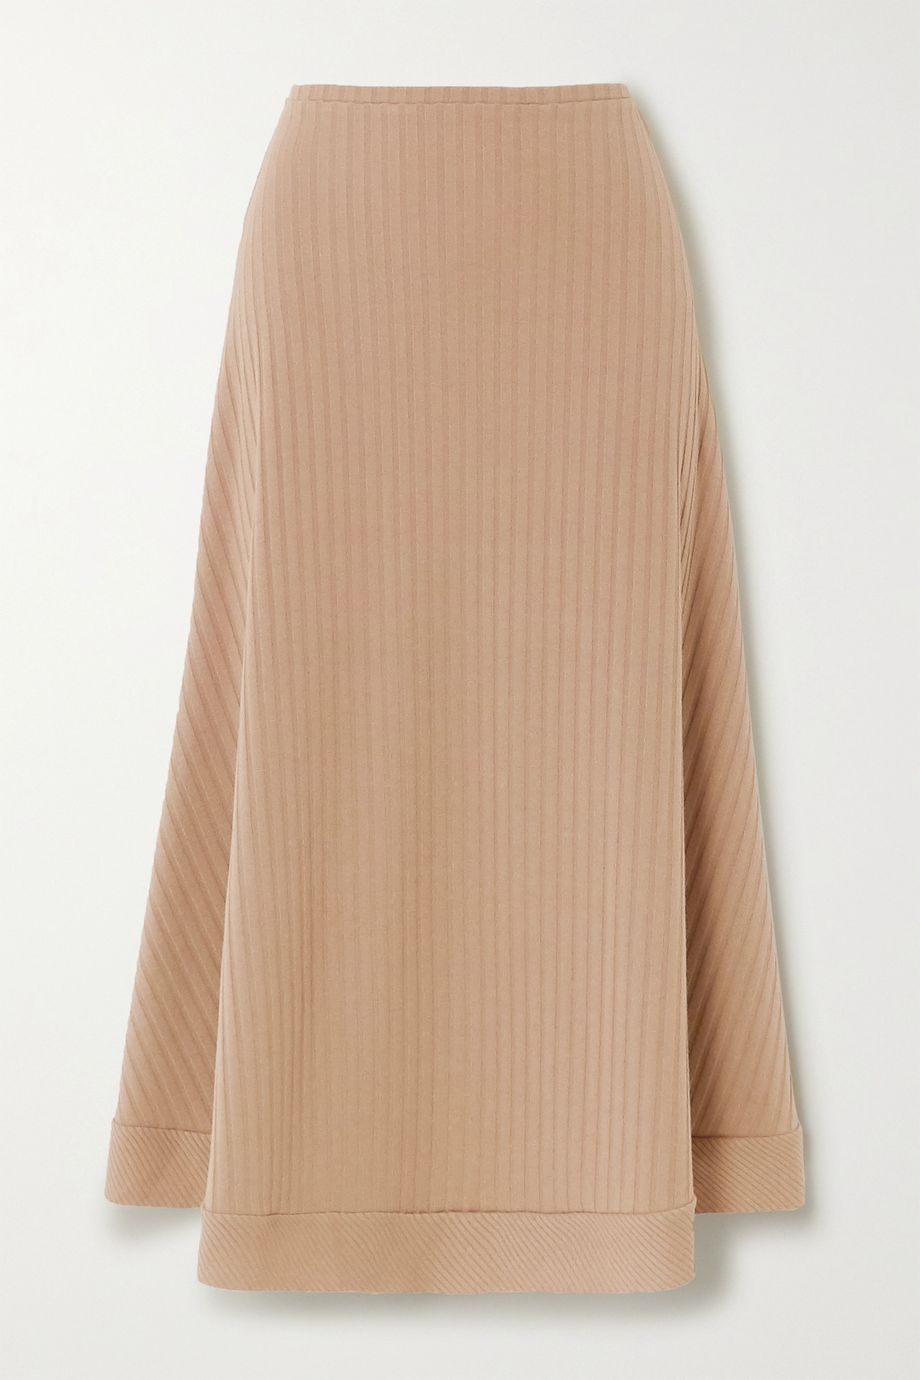 Maggie Marilyn + NET SUSTAIN Sandy Strolls ribbed-knit skirt